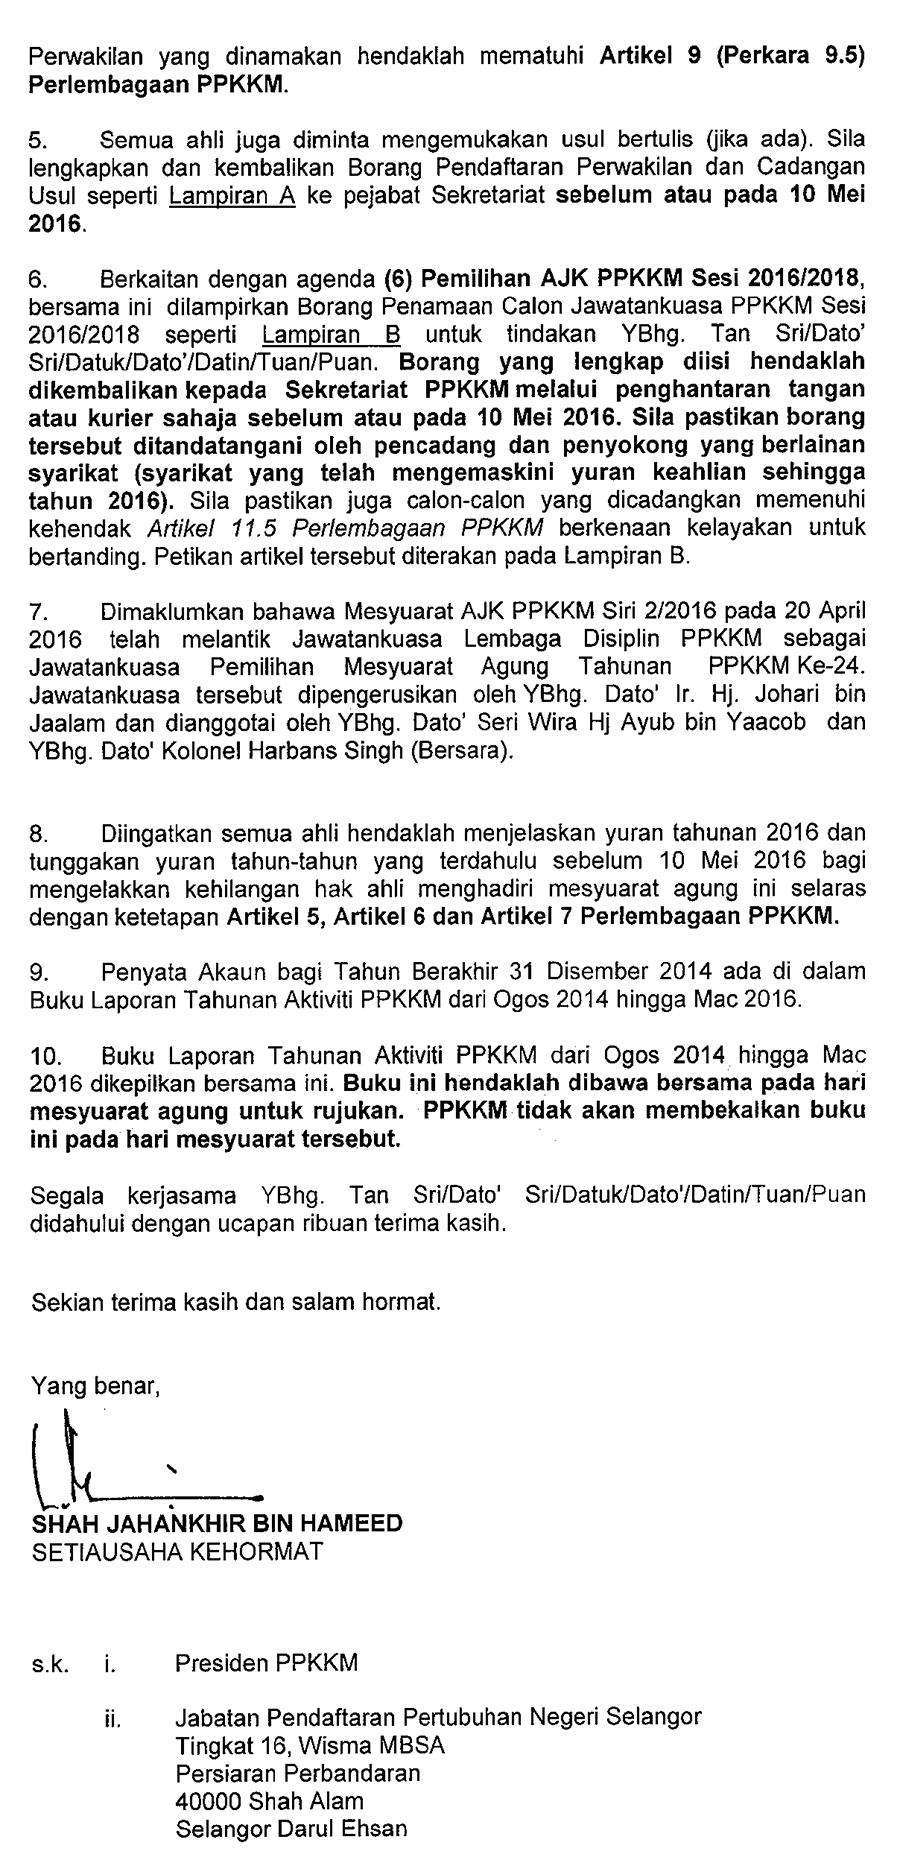 mesyuaratAGM24_2